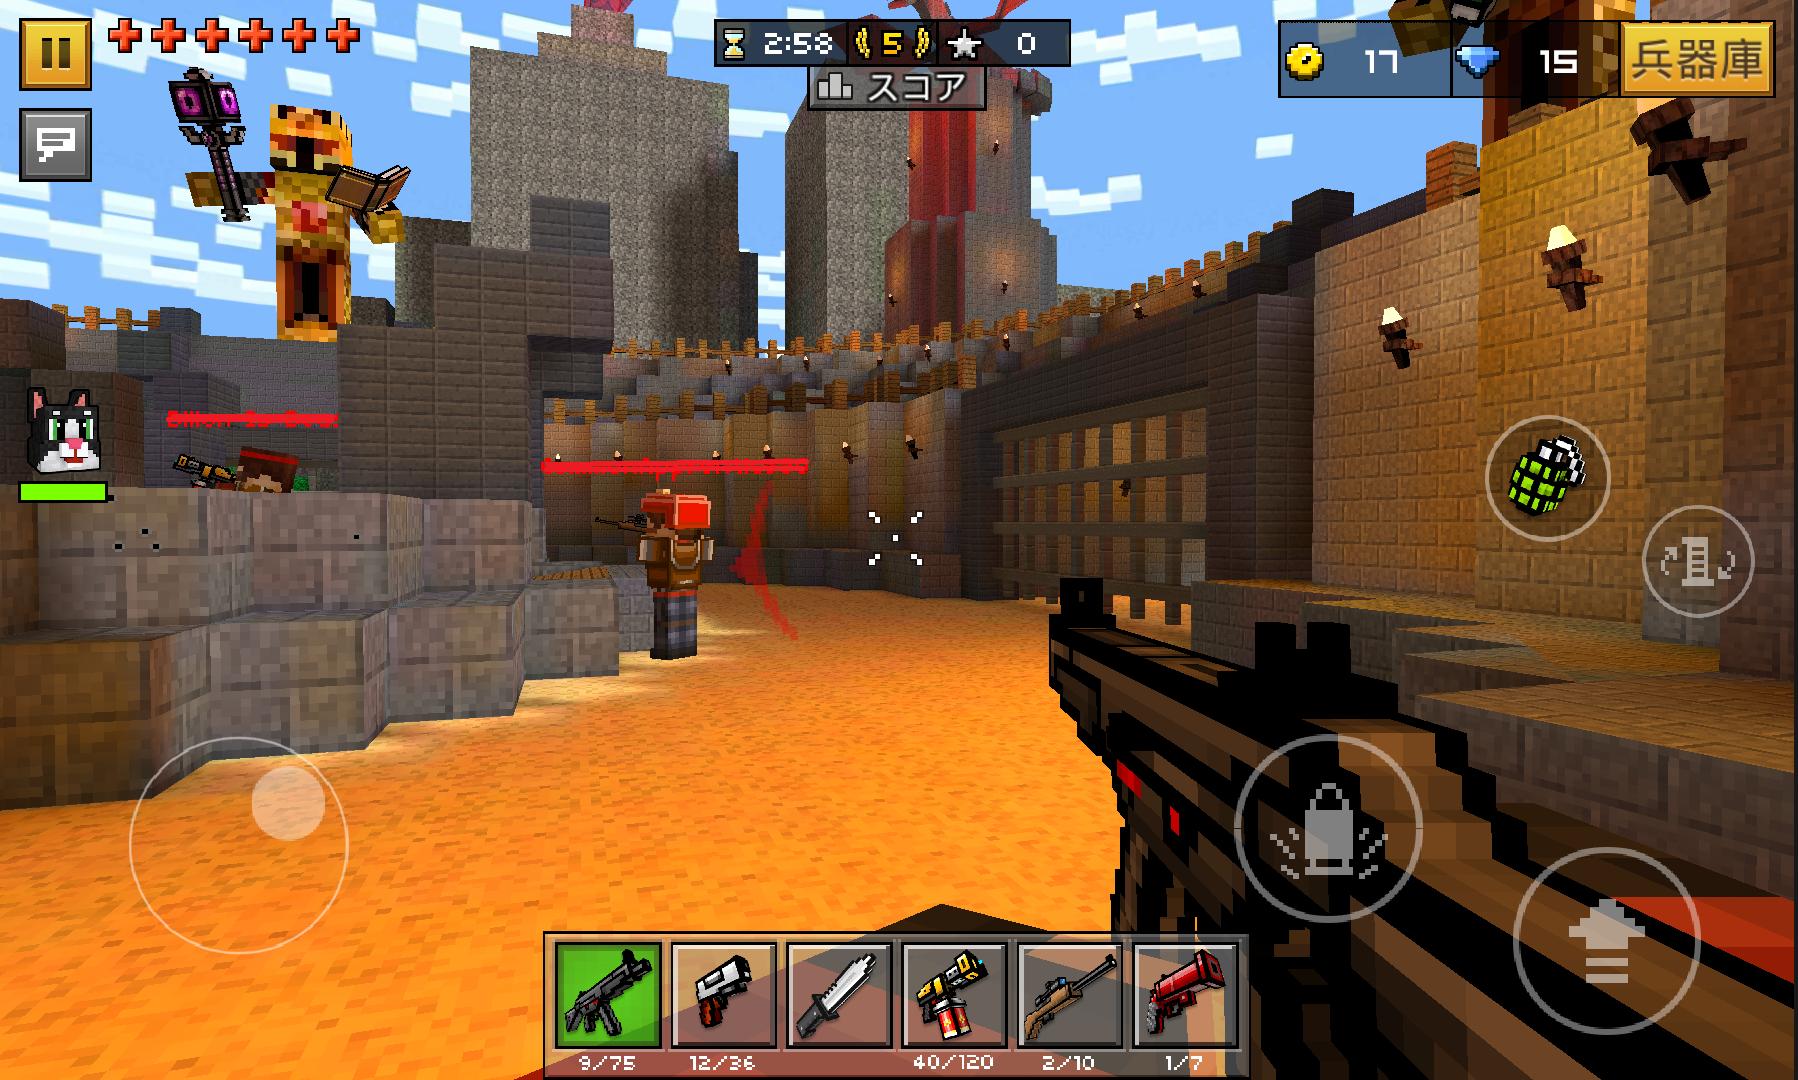 androidアプリ Pixel Gun 3D攻略スクリーンショット5